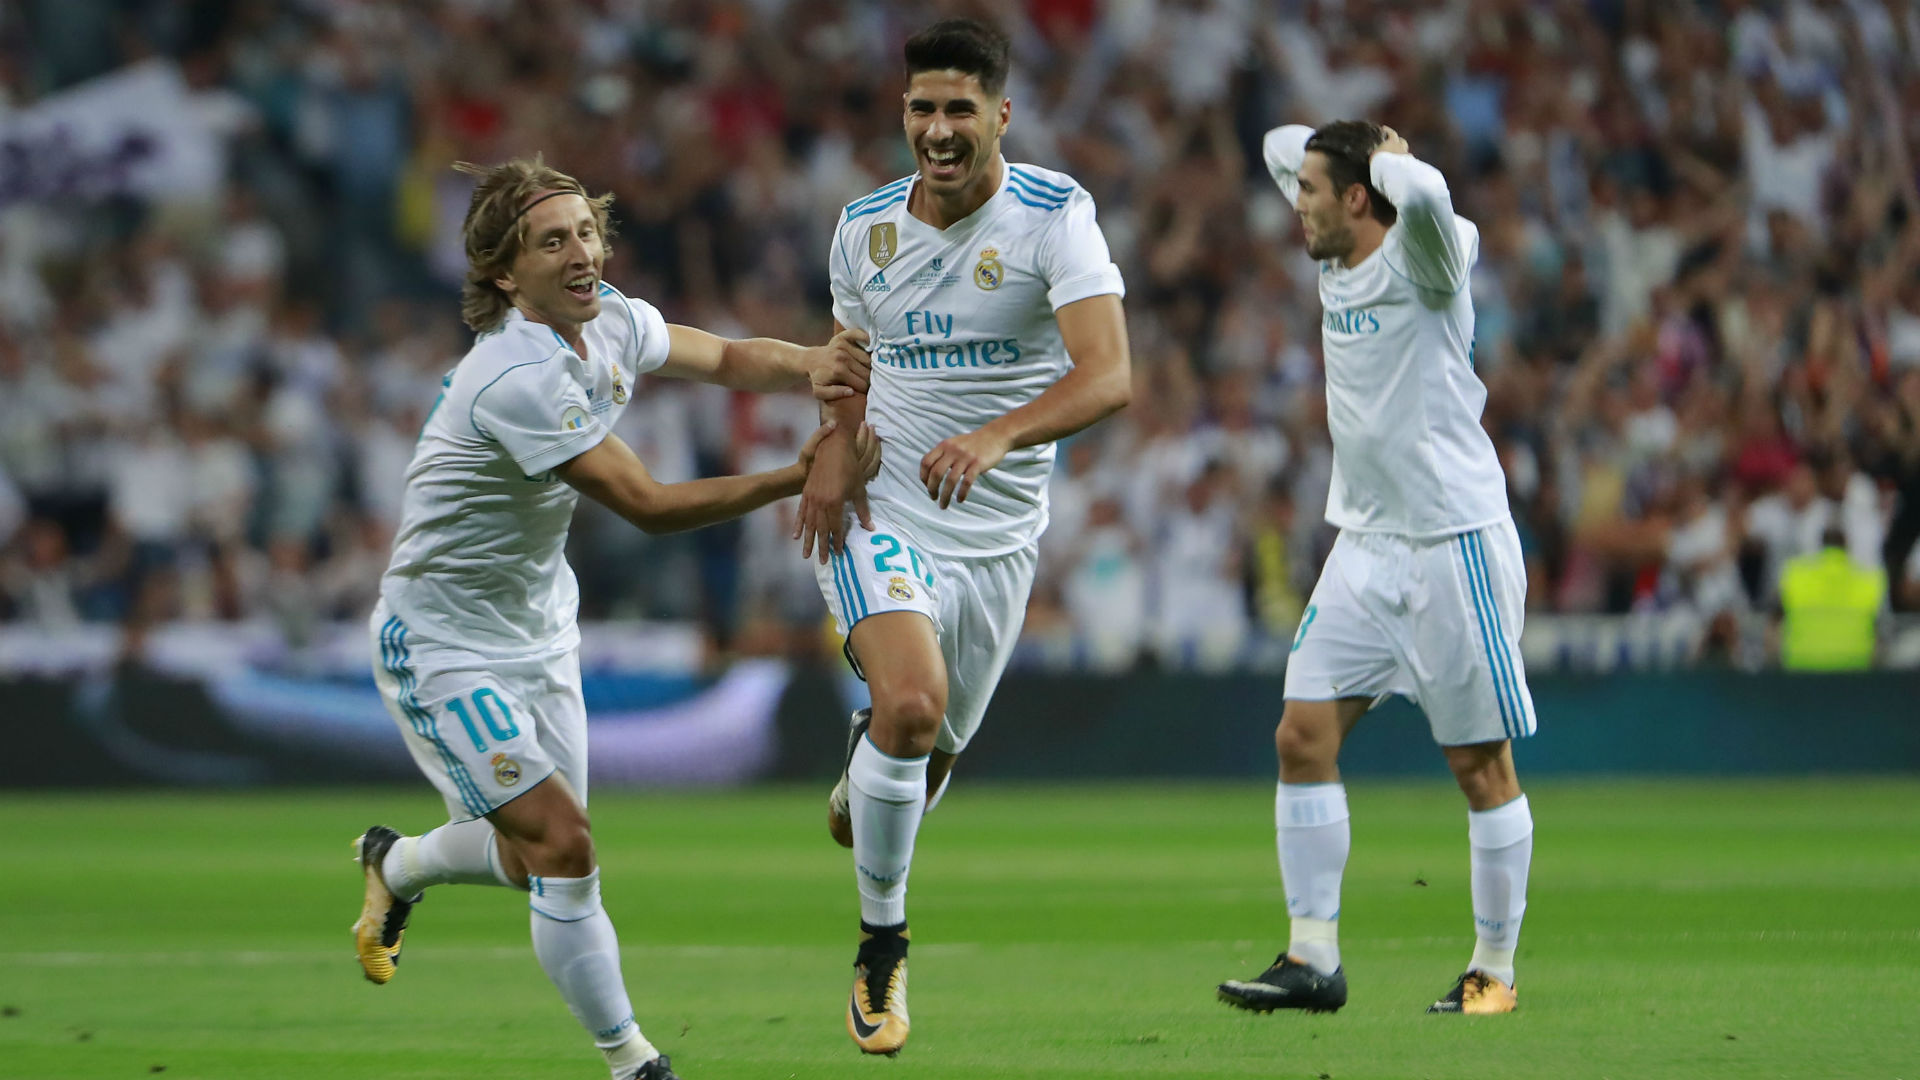 real barcelona - modric asensio kovacic - spain supercup - 2017